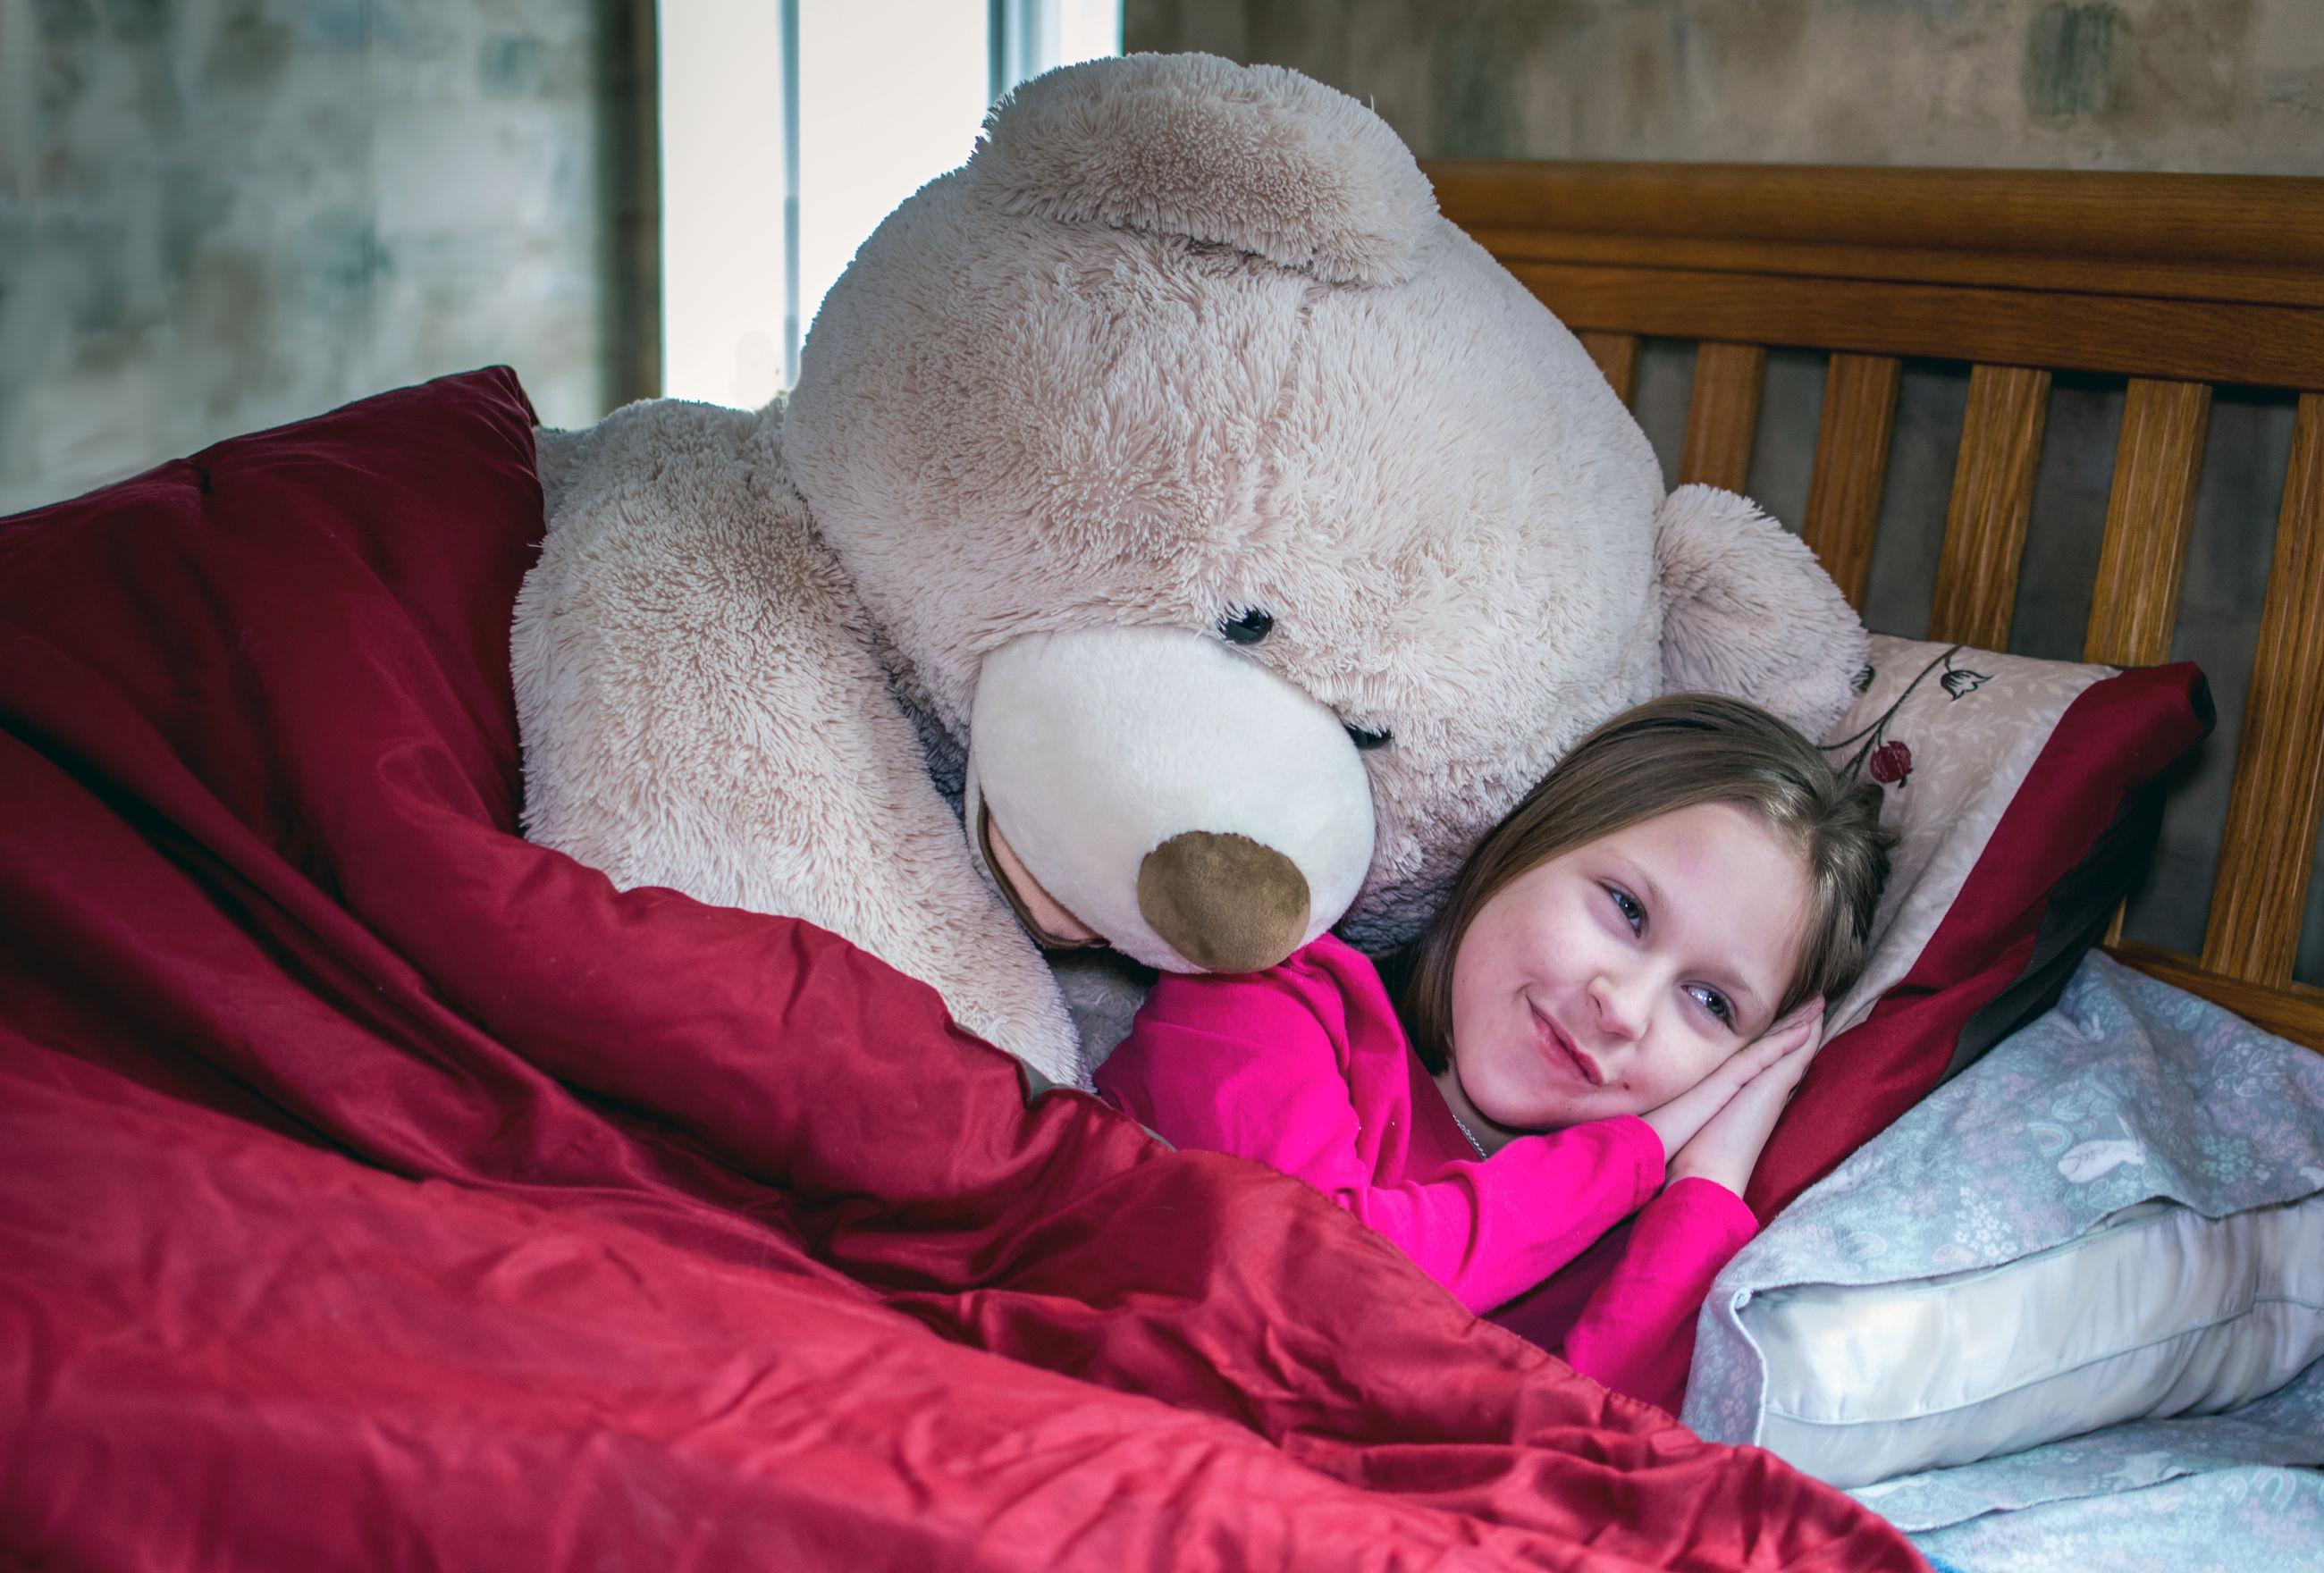 Big stuffed bear asks a little girl if she is awake or sleeping